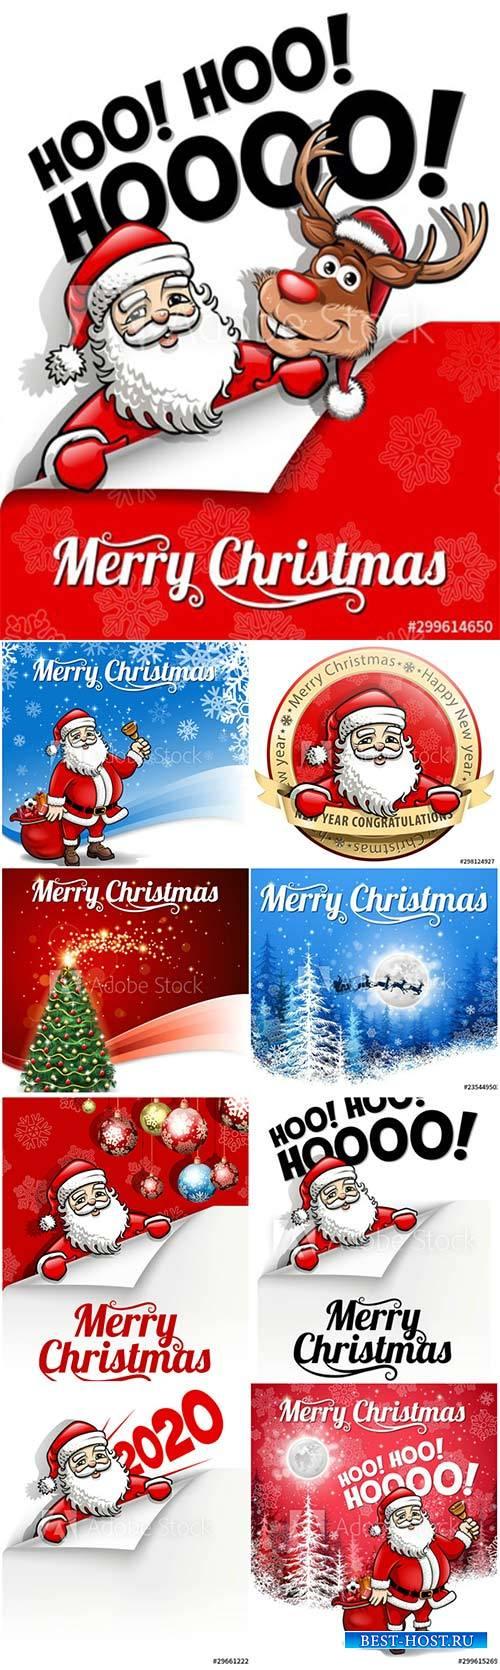 Santa's Christmas snowy greeting, Merry Christmas card